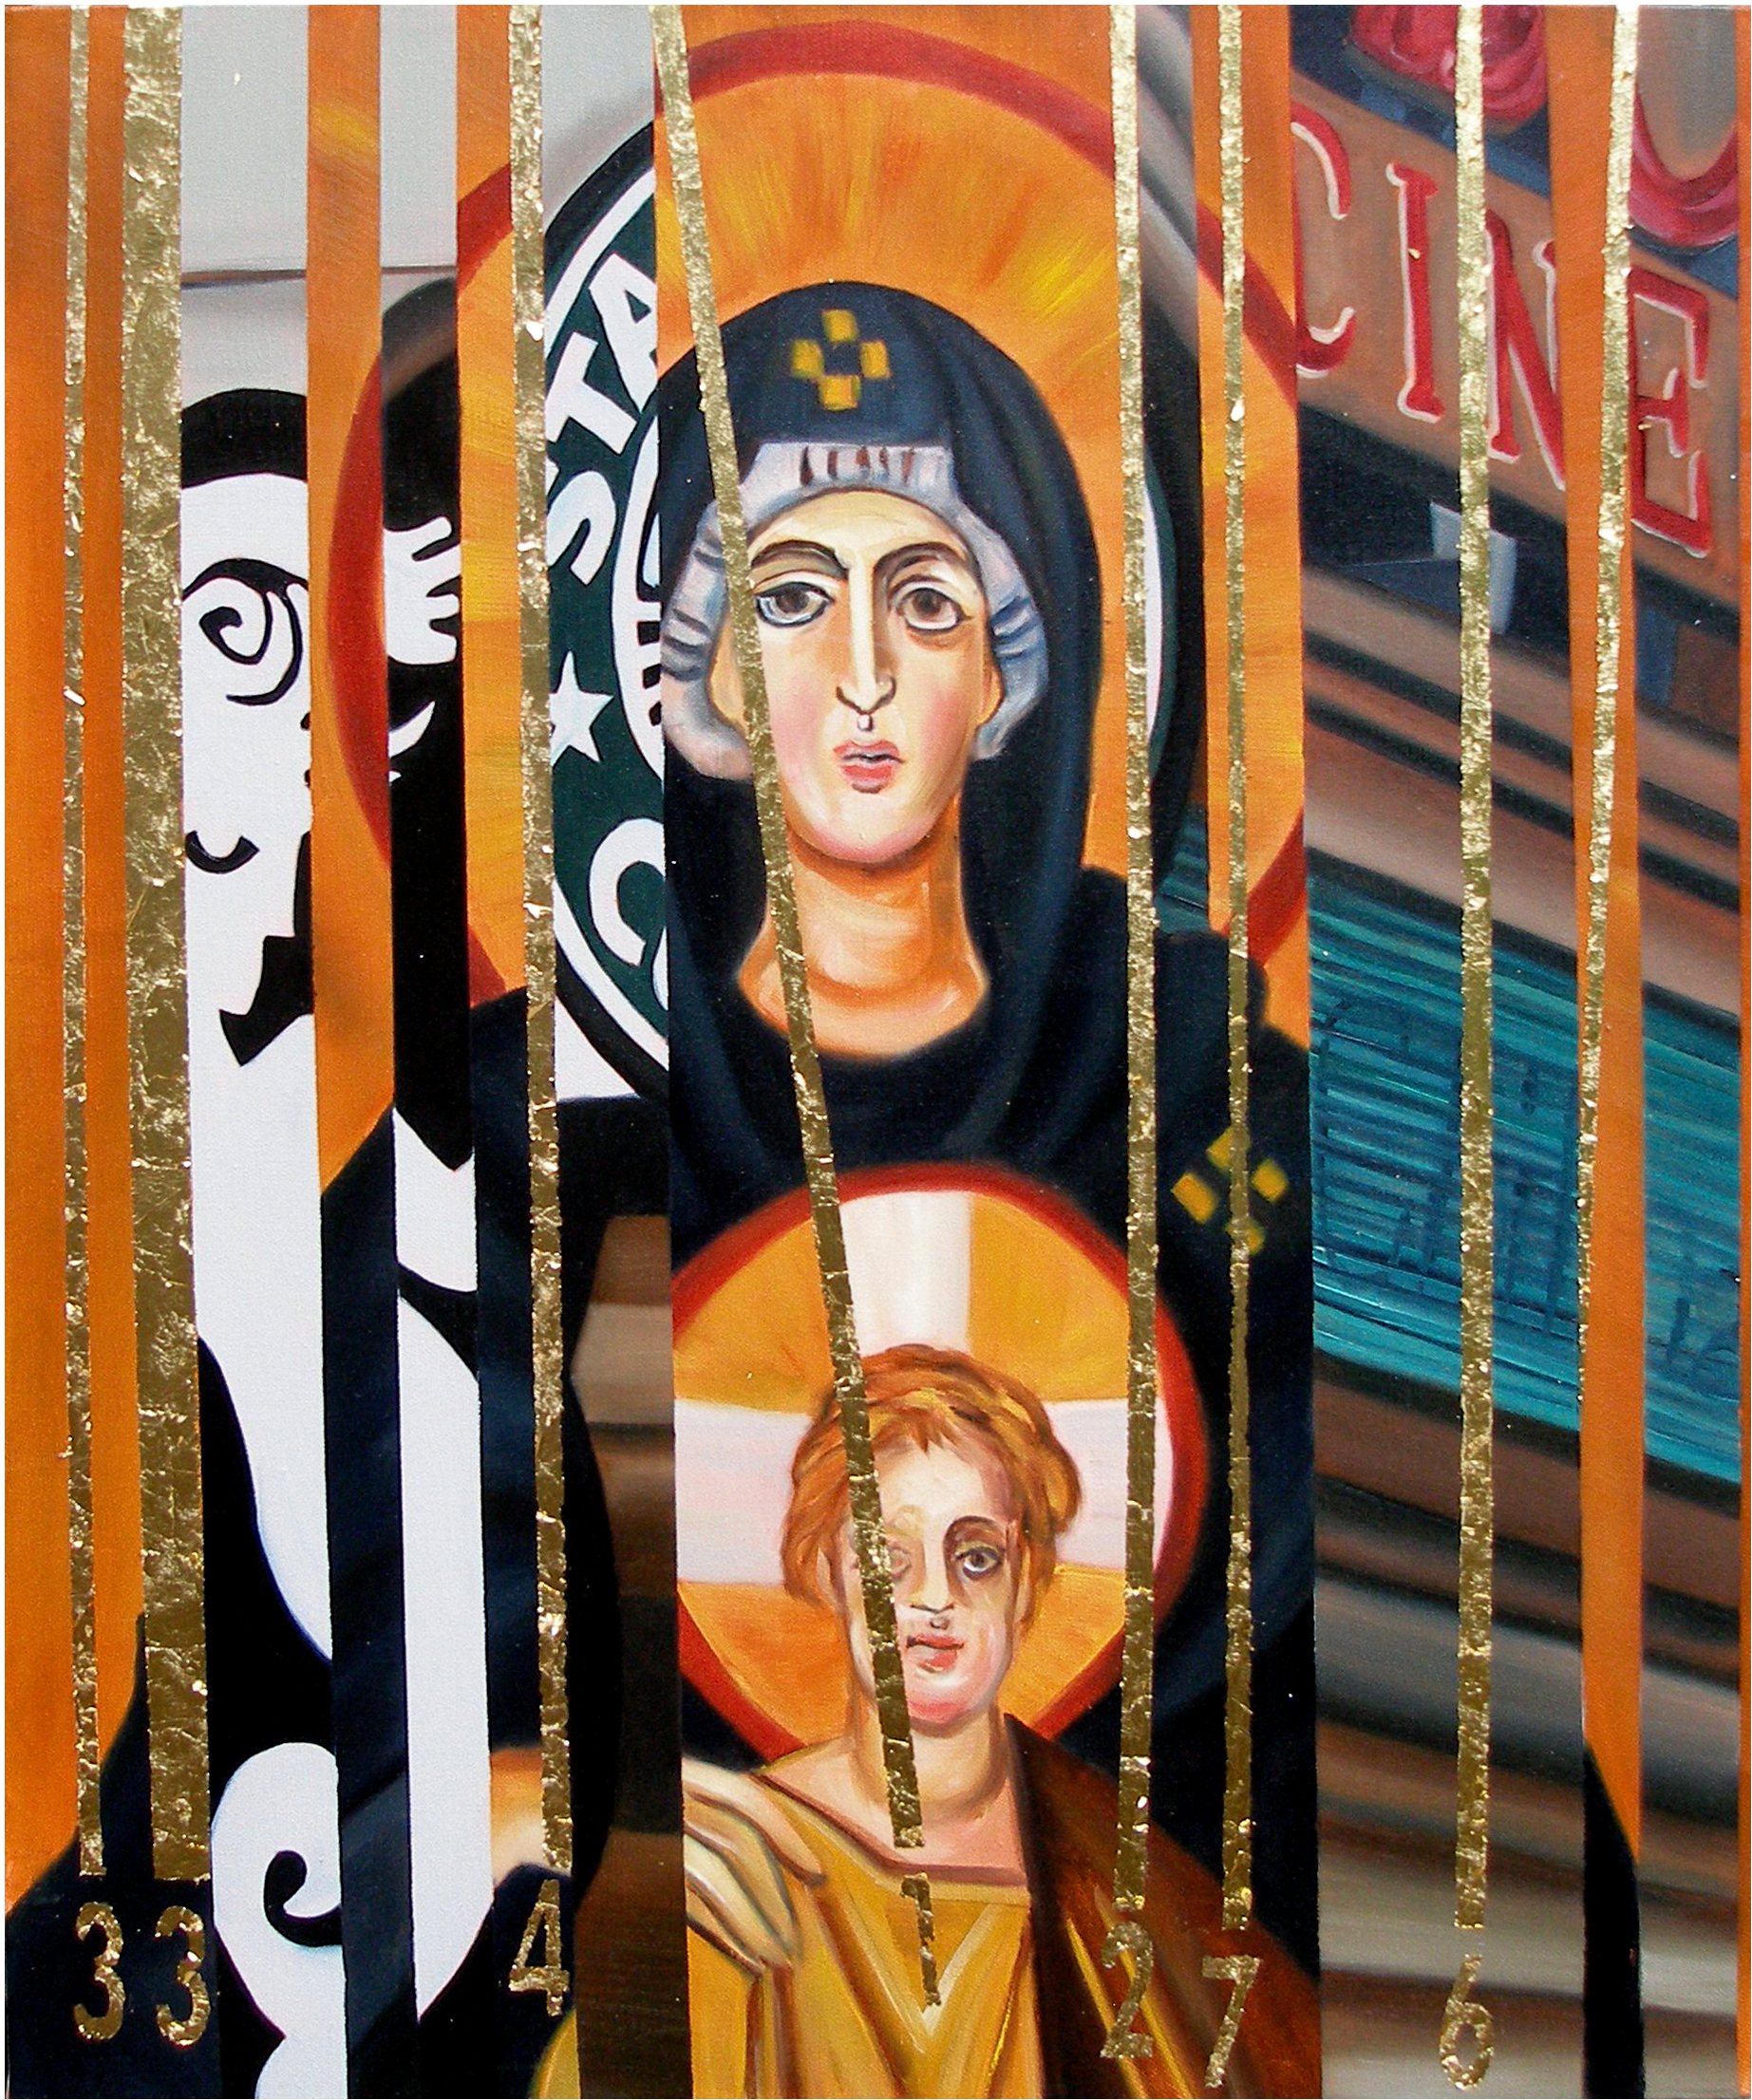 5.ayasofya1,Hagia Sofia1, Santa Sofia1-60x70cm tuval üzerine yaglıboya,oil on canvas,óleo sobre tela.jpg